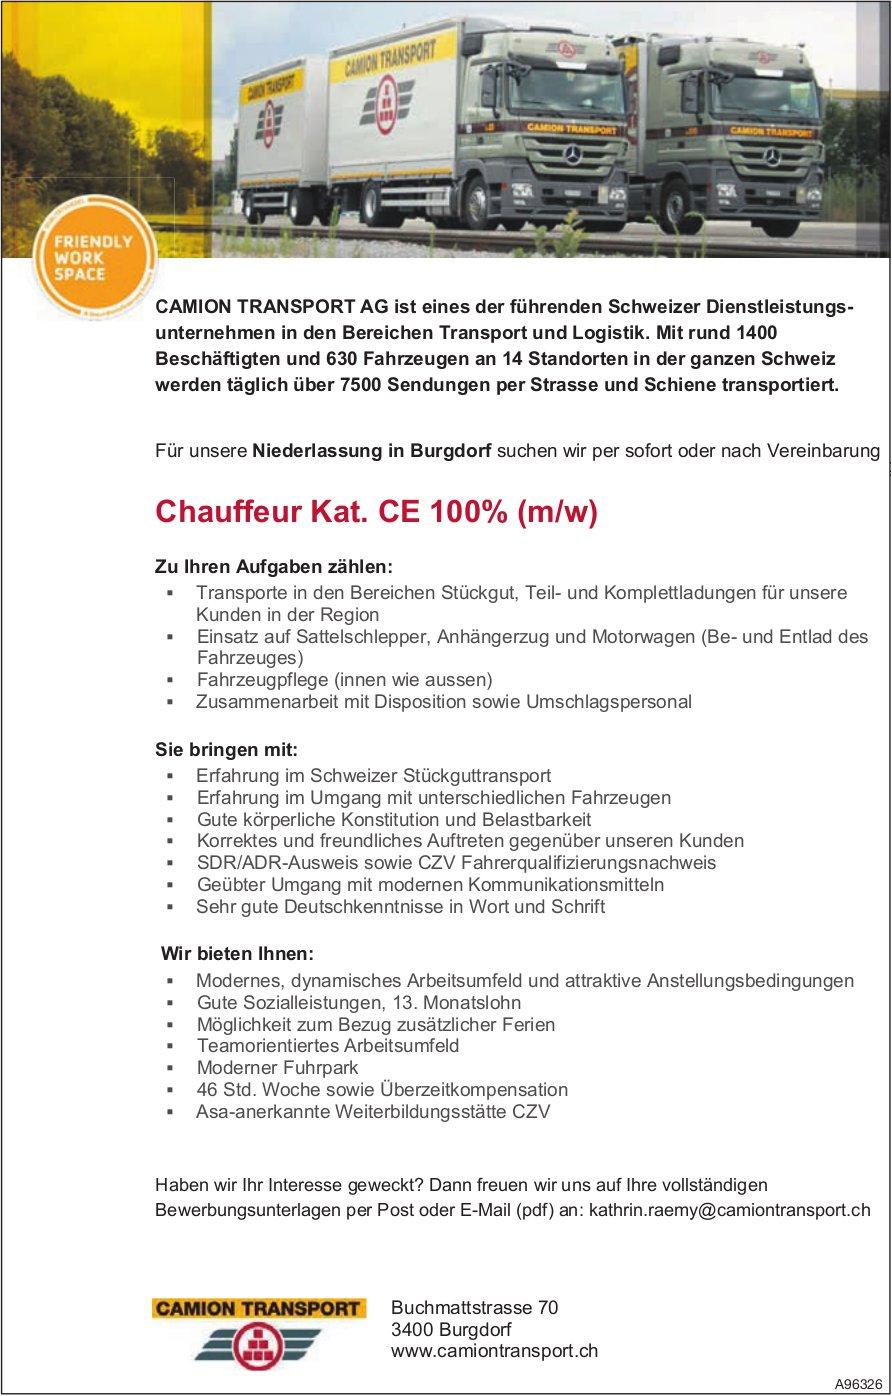 Chauffeur Kat. CE 100% (m/w), Camion Transport AG, Burgdorf, gesucht